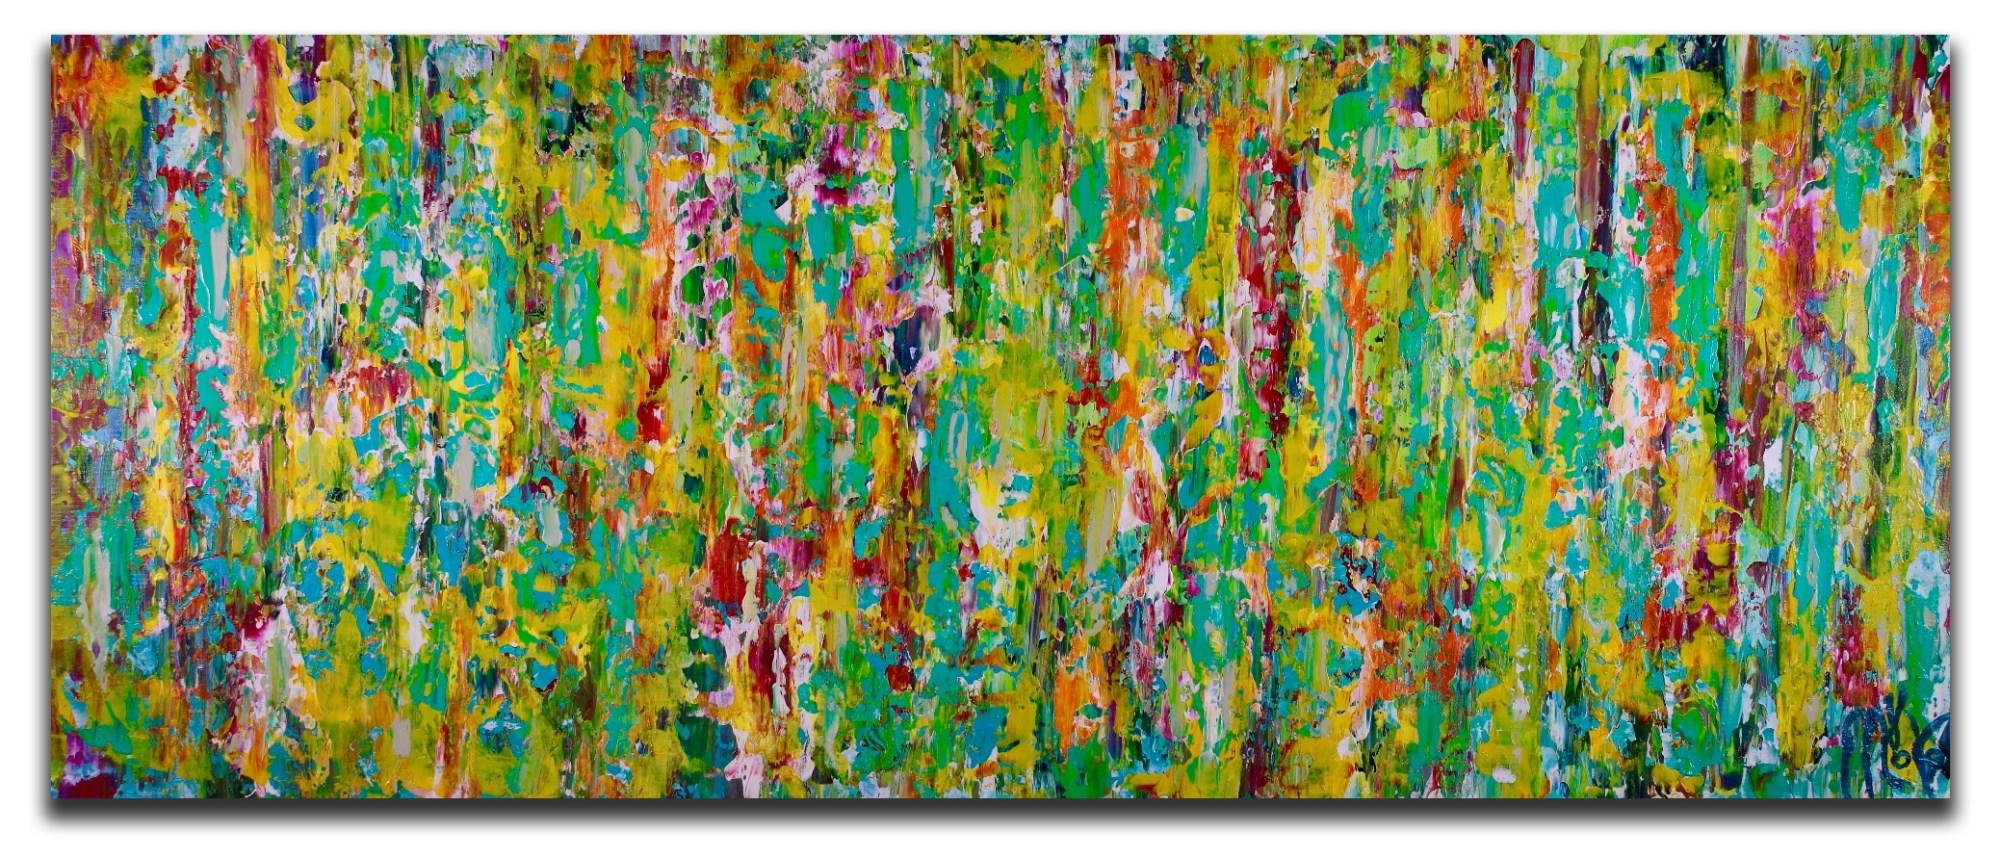 Secret frenzy (2018) Expressionistic Acrylic painting by Nestor Toro